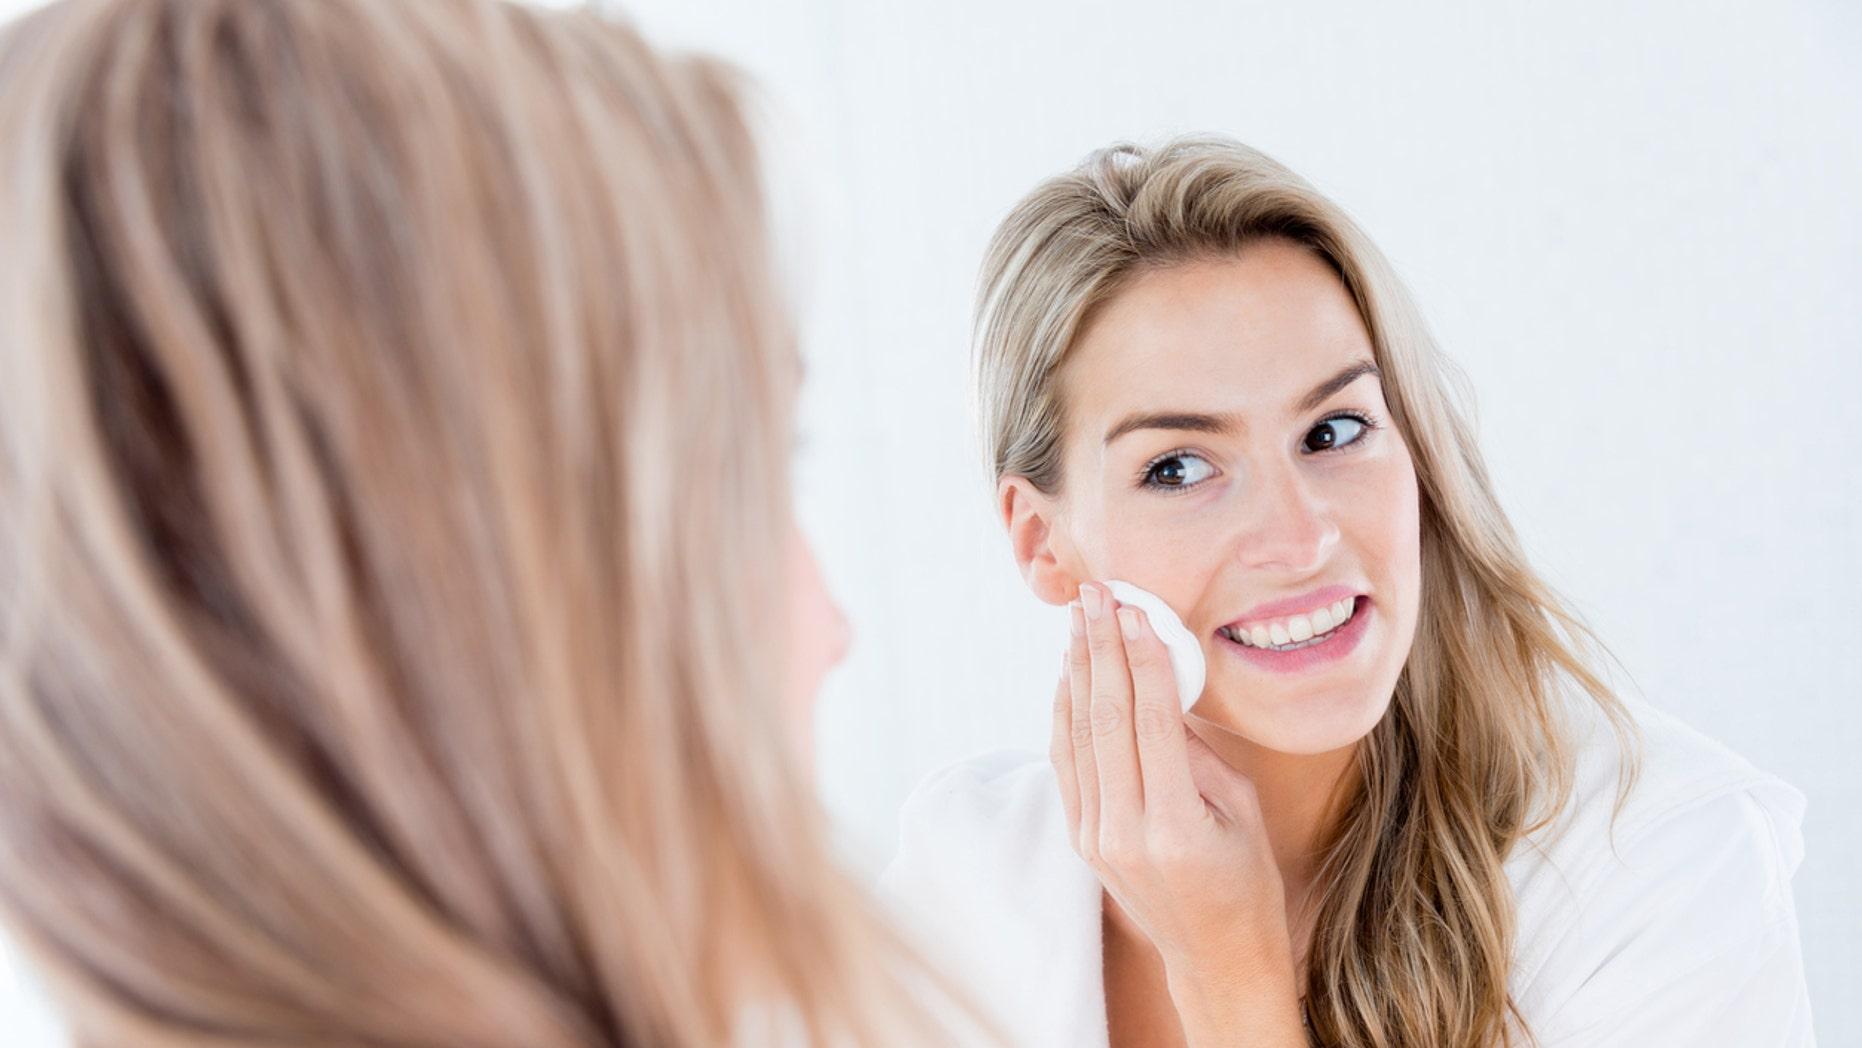 Facial age spot removal